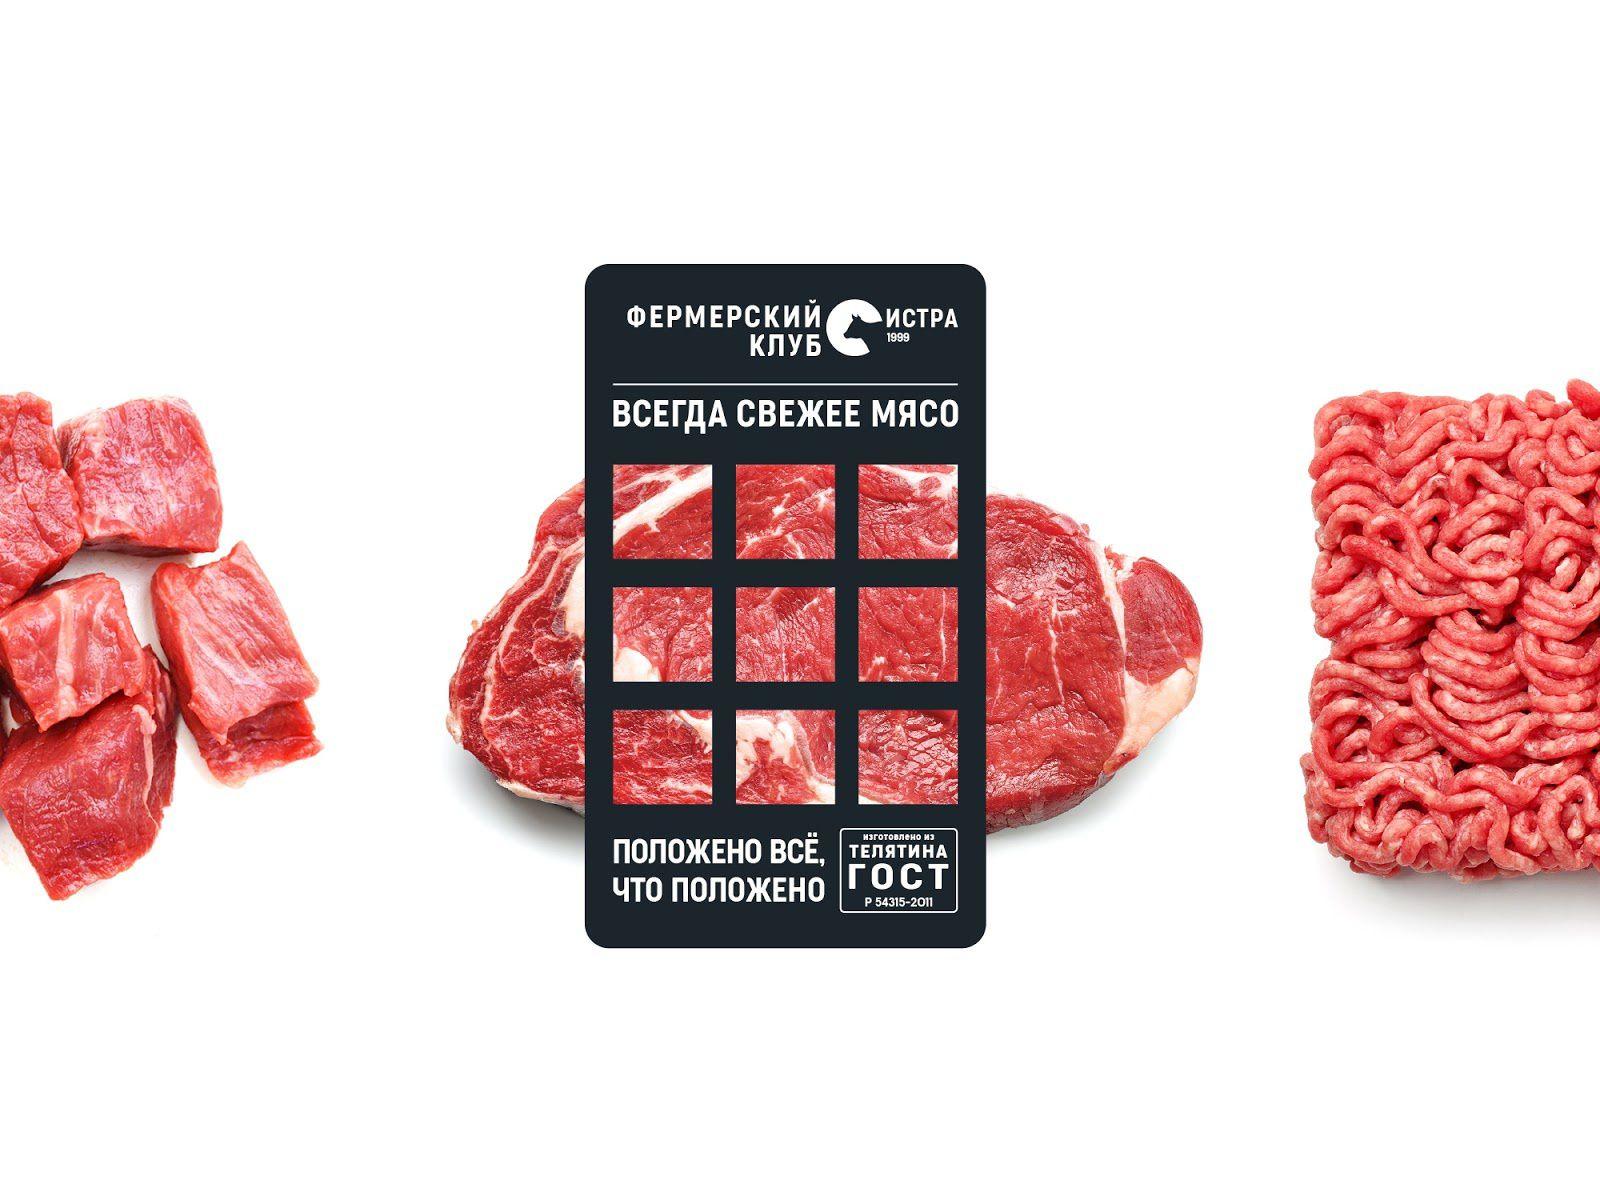 "Farmers Club Istra - LLC ""KRROS"" (viande de bœuf) I Design : Style You branding agency, Moscou, Russie (juin 2019)"